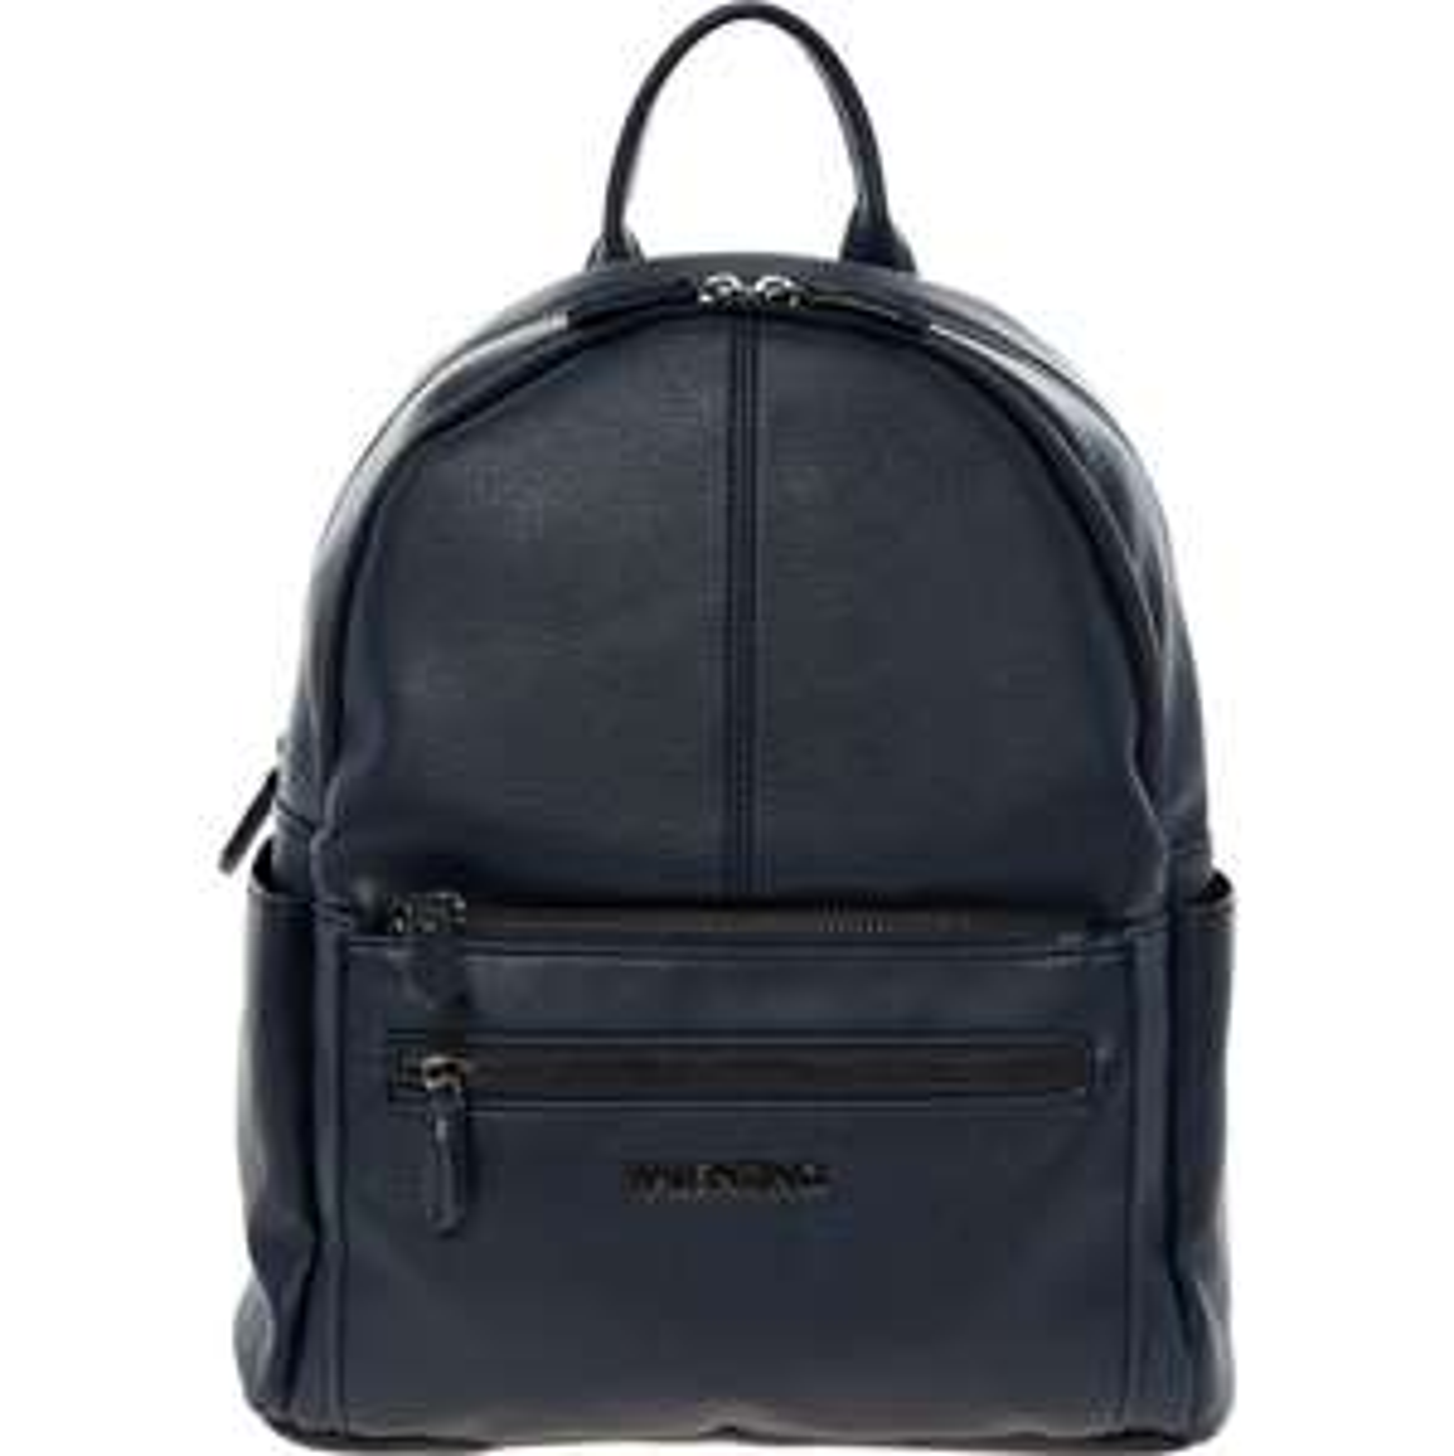 Valentino By Mario Valentino Navy Steady Backpack - £39.99 / £43.98 delivered @ TK Maxx